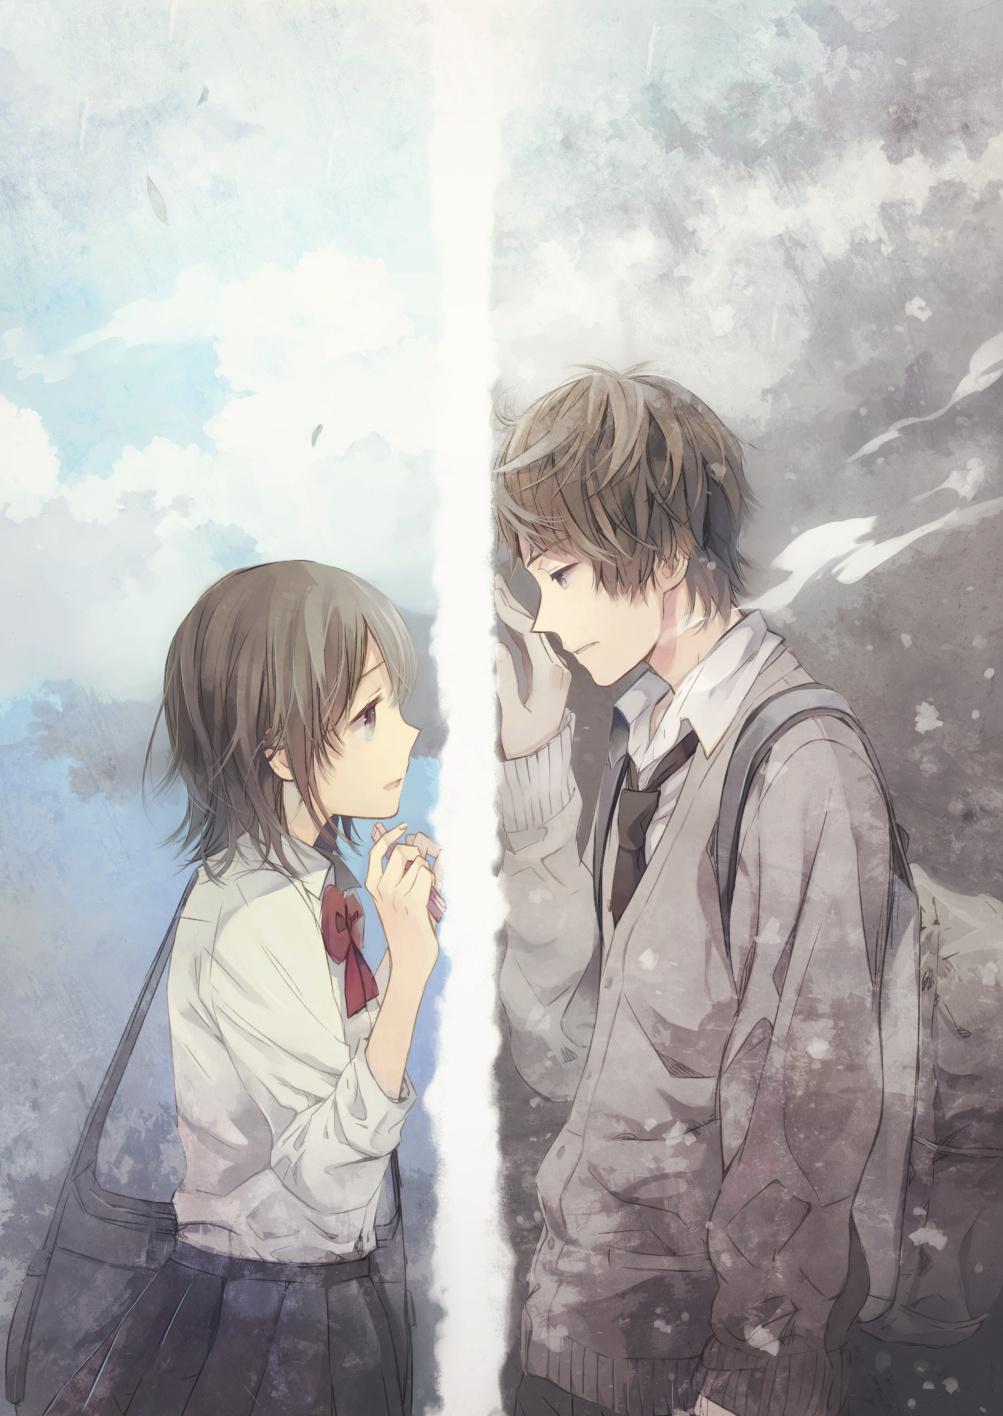 Anime Couples Breaking Up Tumblr 求几张唯美有意�...